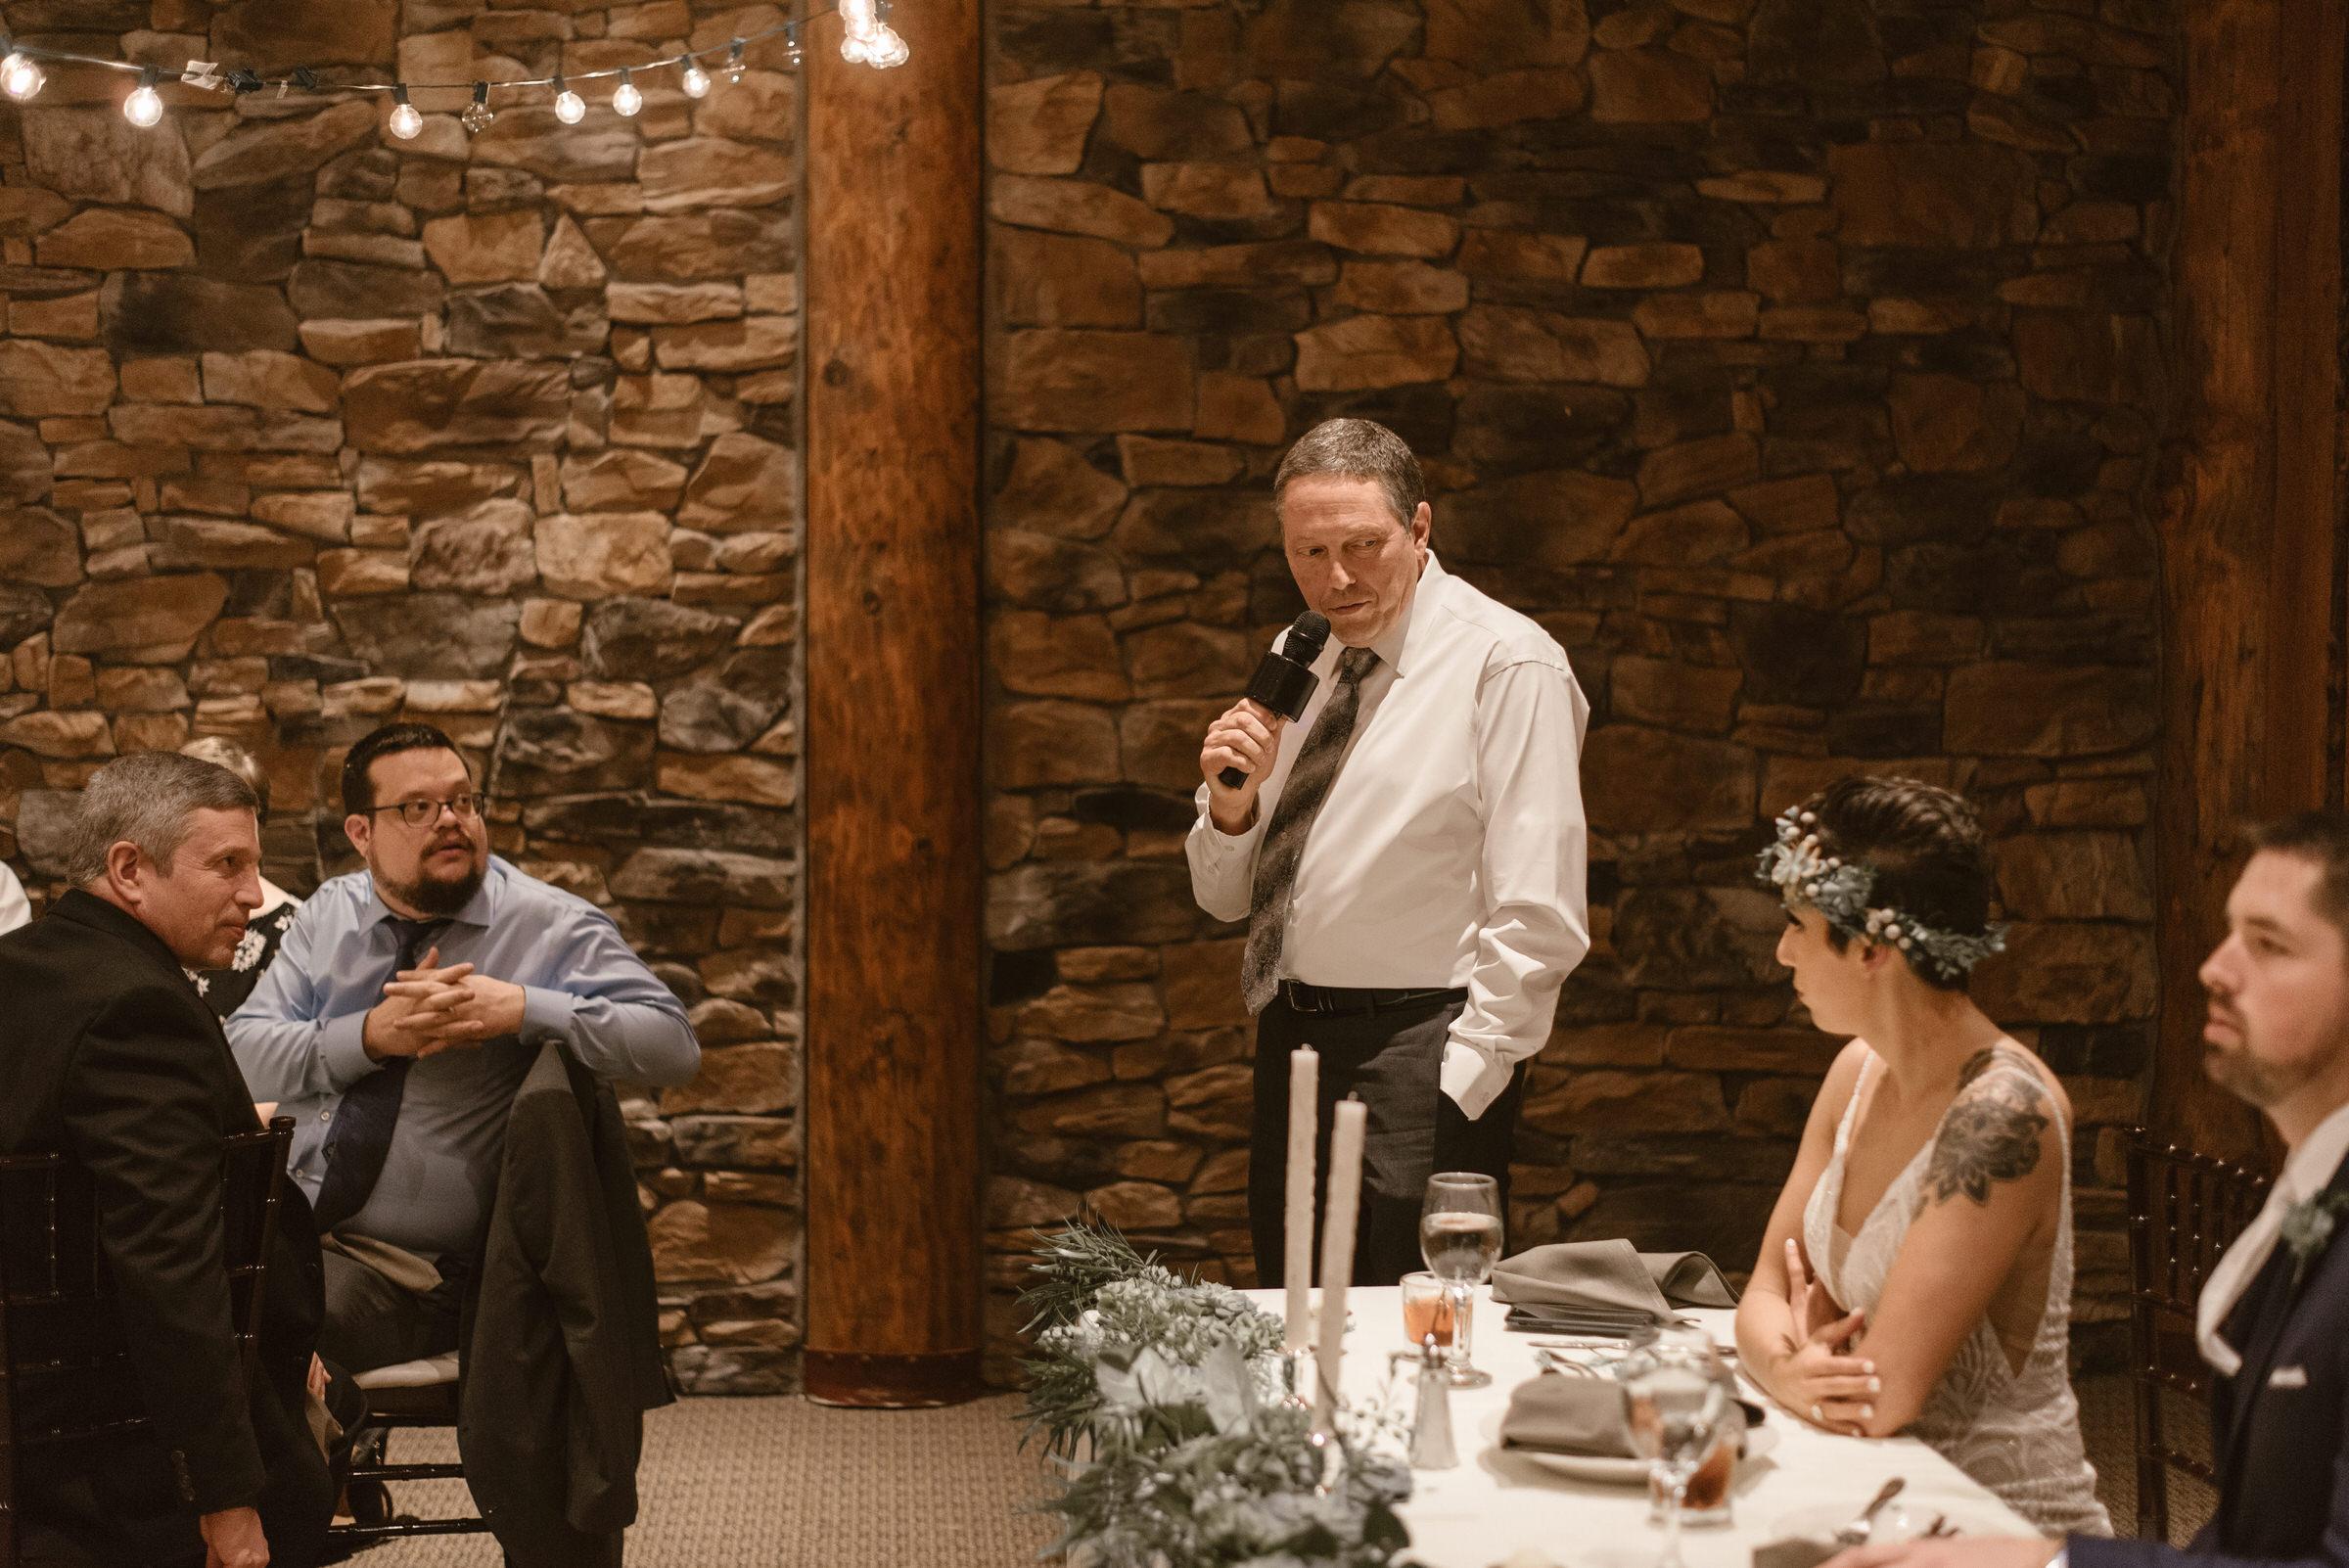 Wilderness-Ridge-Lincoln-Nebraska-Wedding-Kaylie-Sirek-Photography-105.jpg